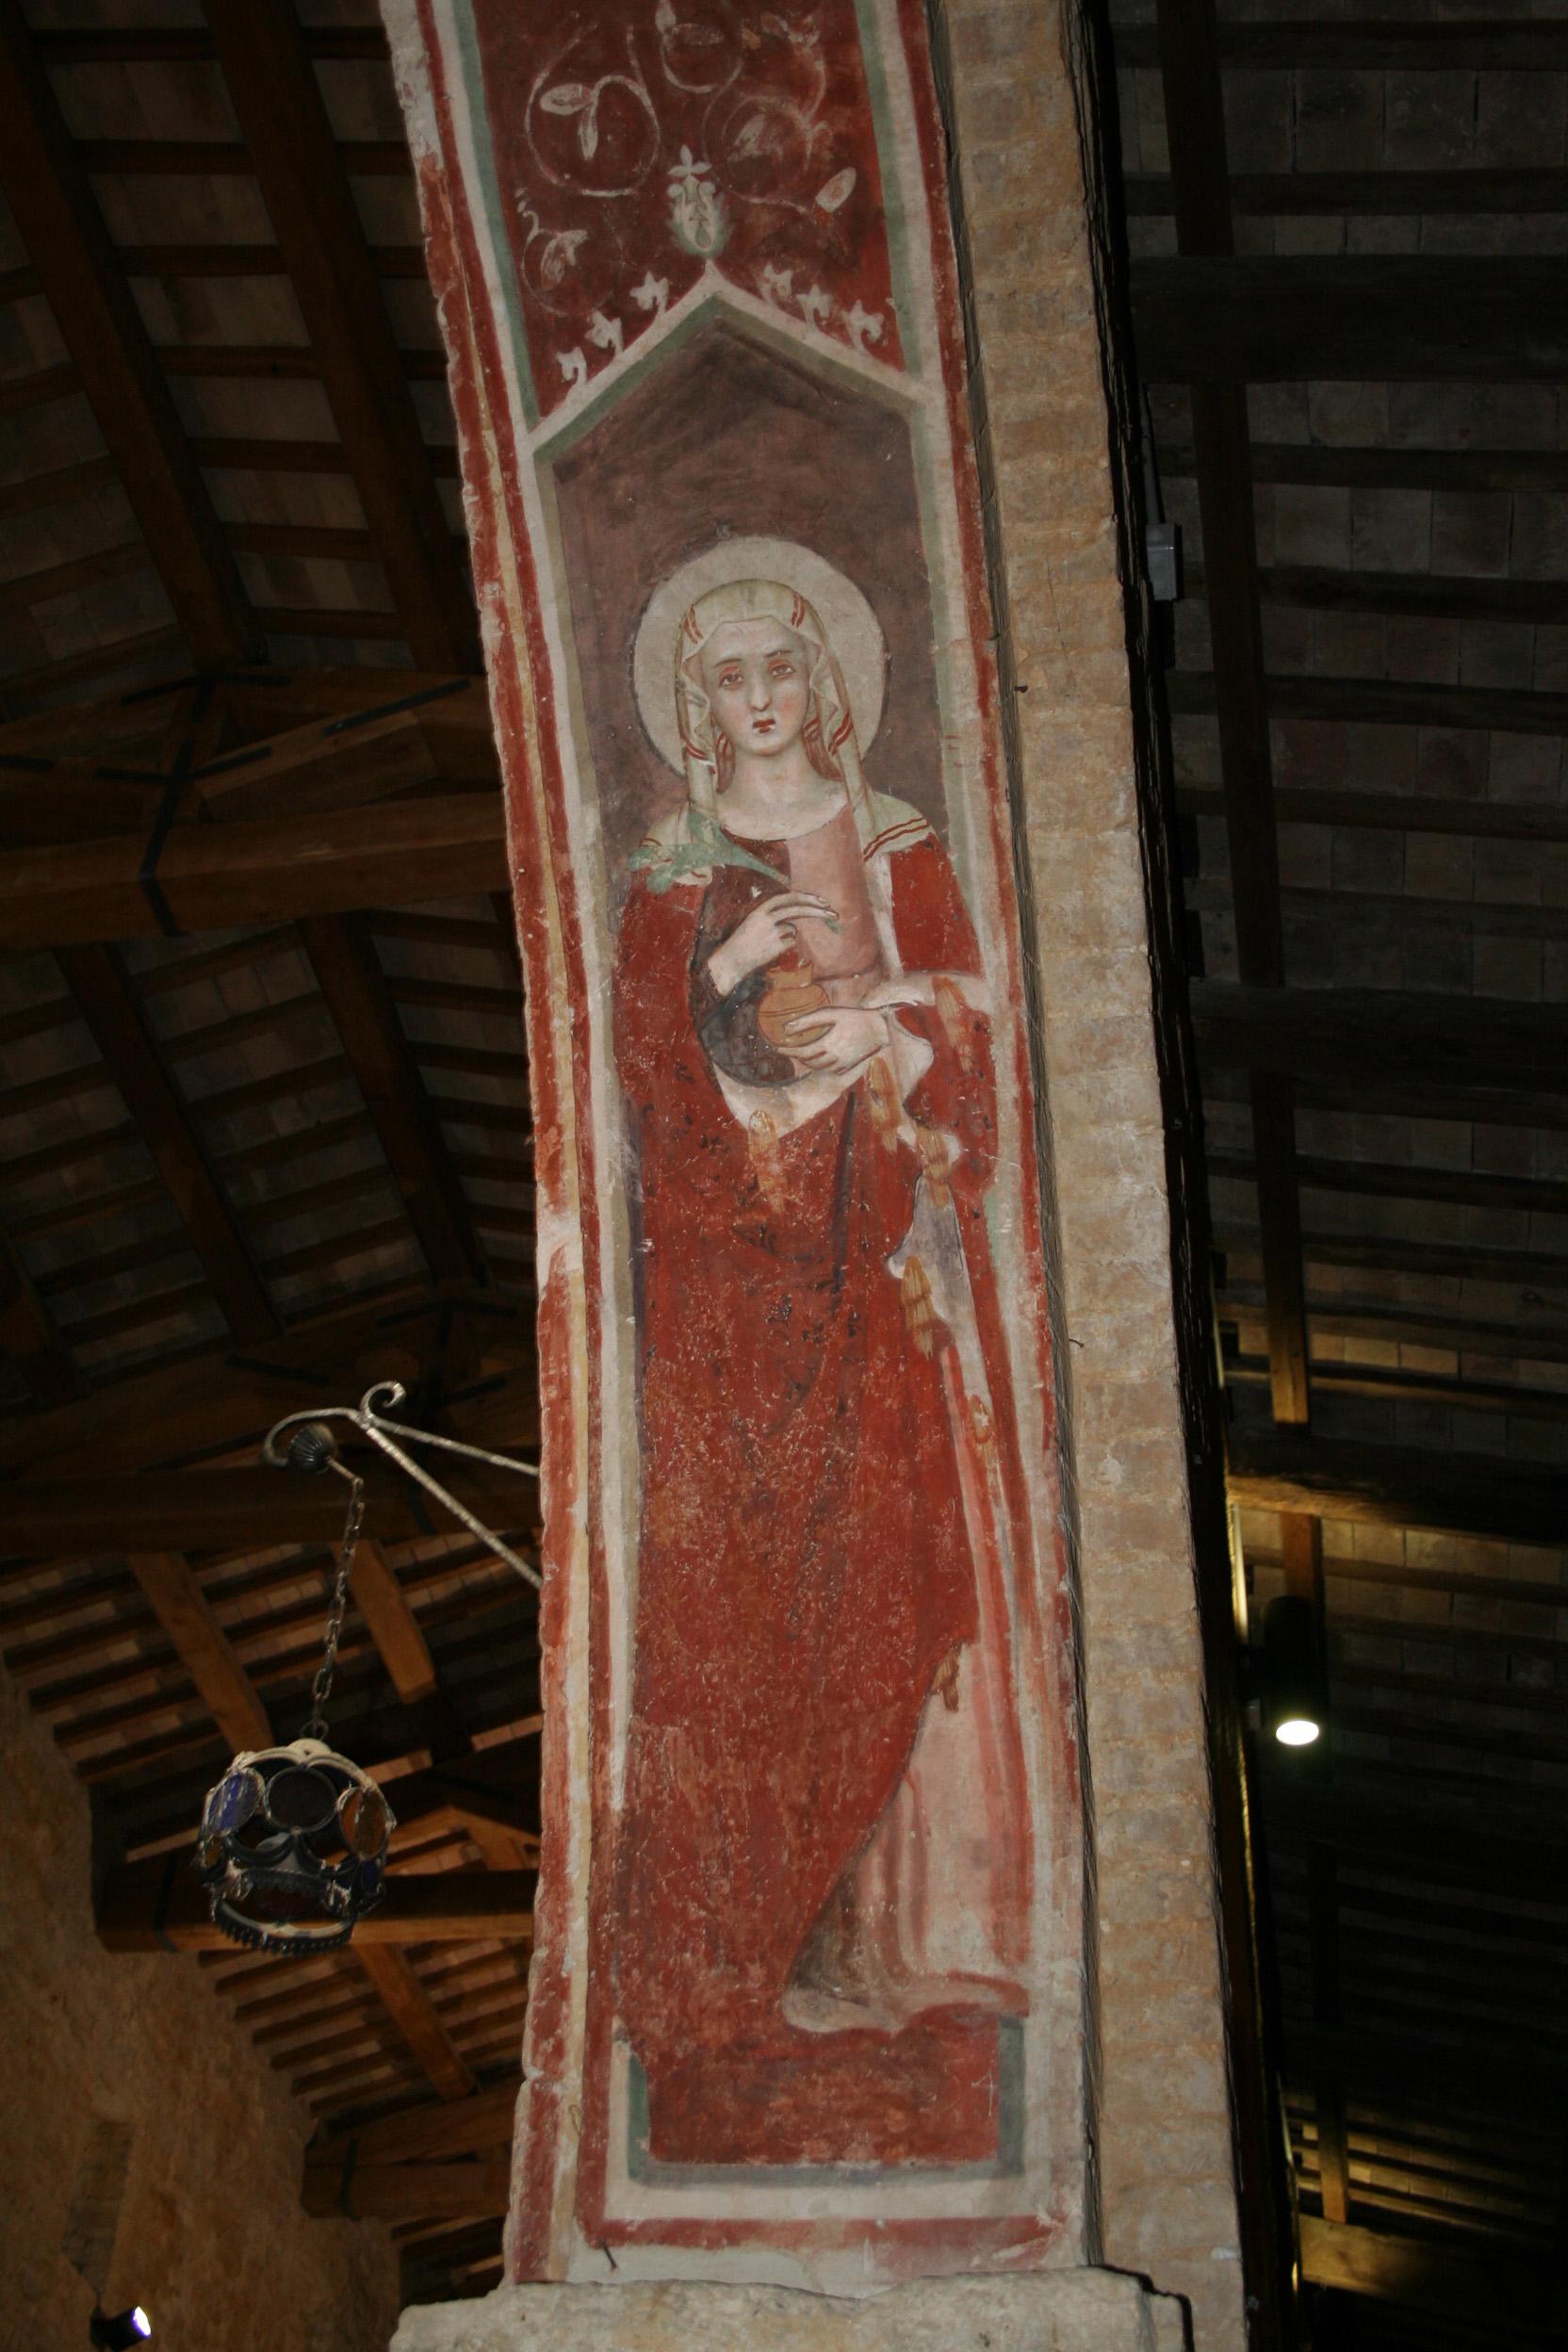 Freske av Illuminata i kirken San Salvatore i Canzano i provinsen Teramo i regionen Abruzzo